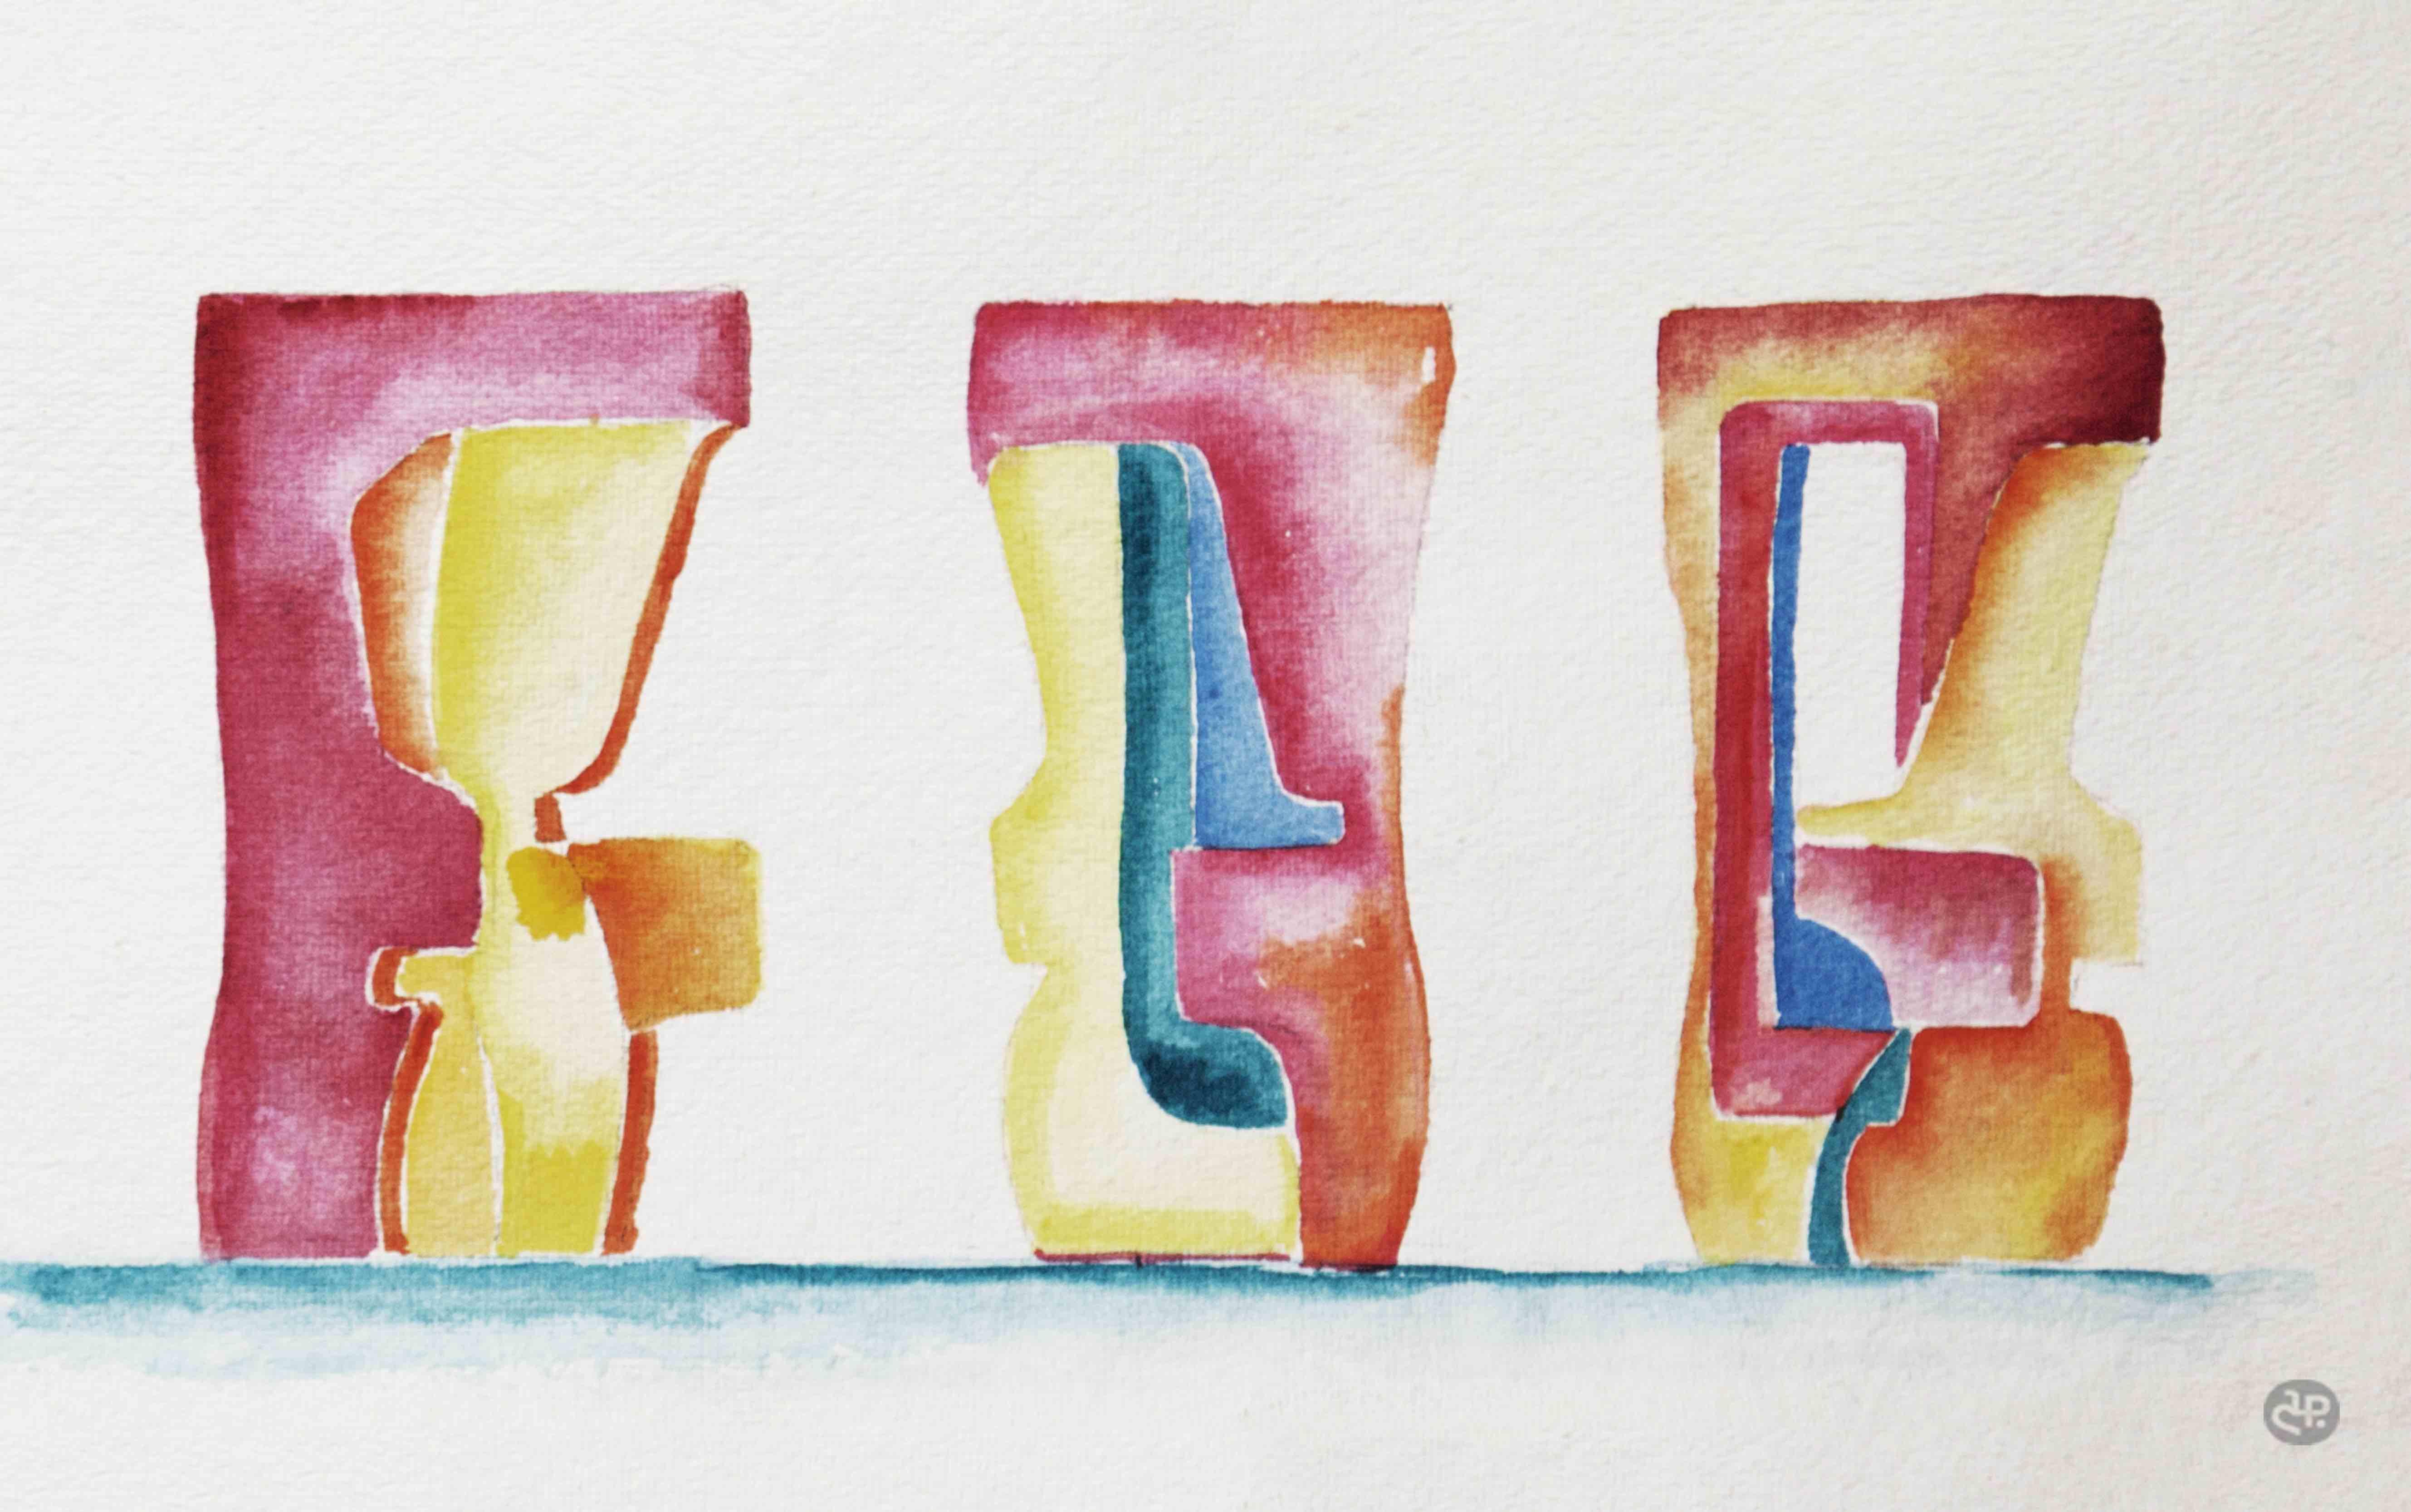 """Carving the Senses""di Satyendra Pakhalé - Tubes a Venice Design 2016"